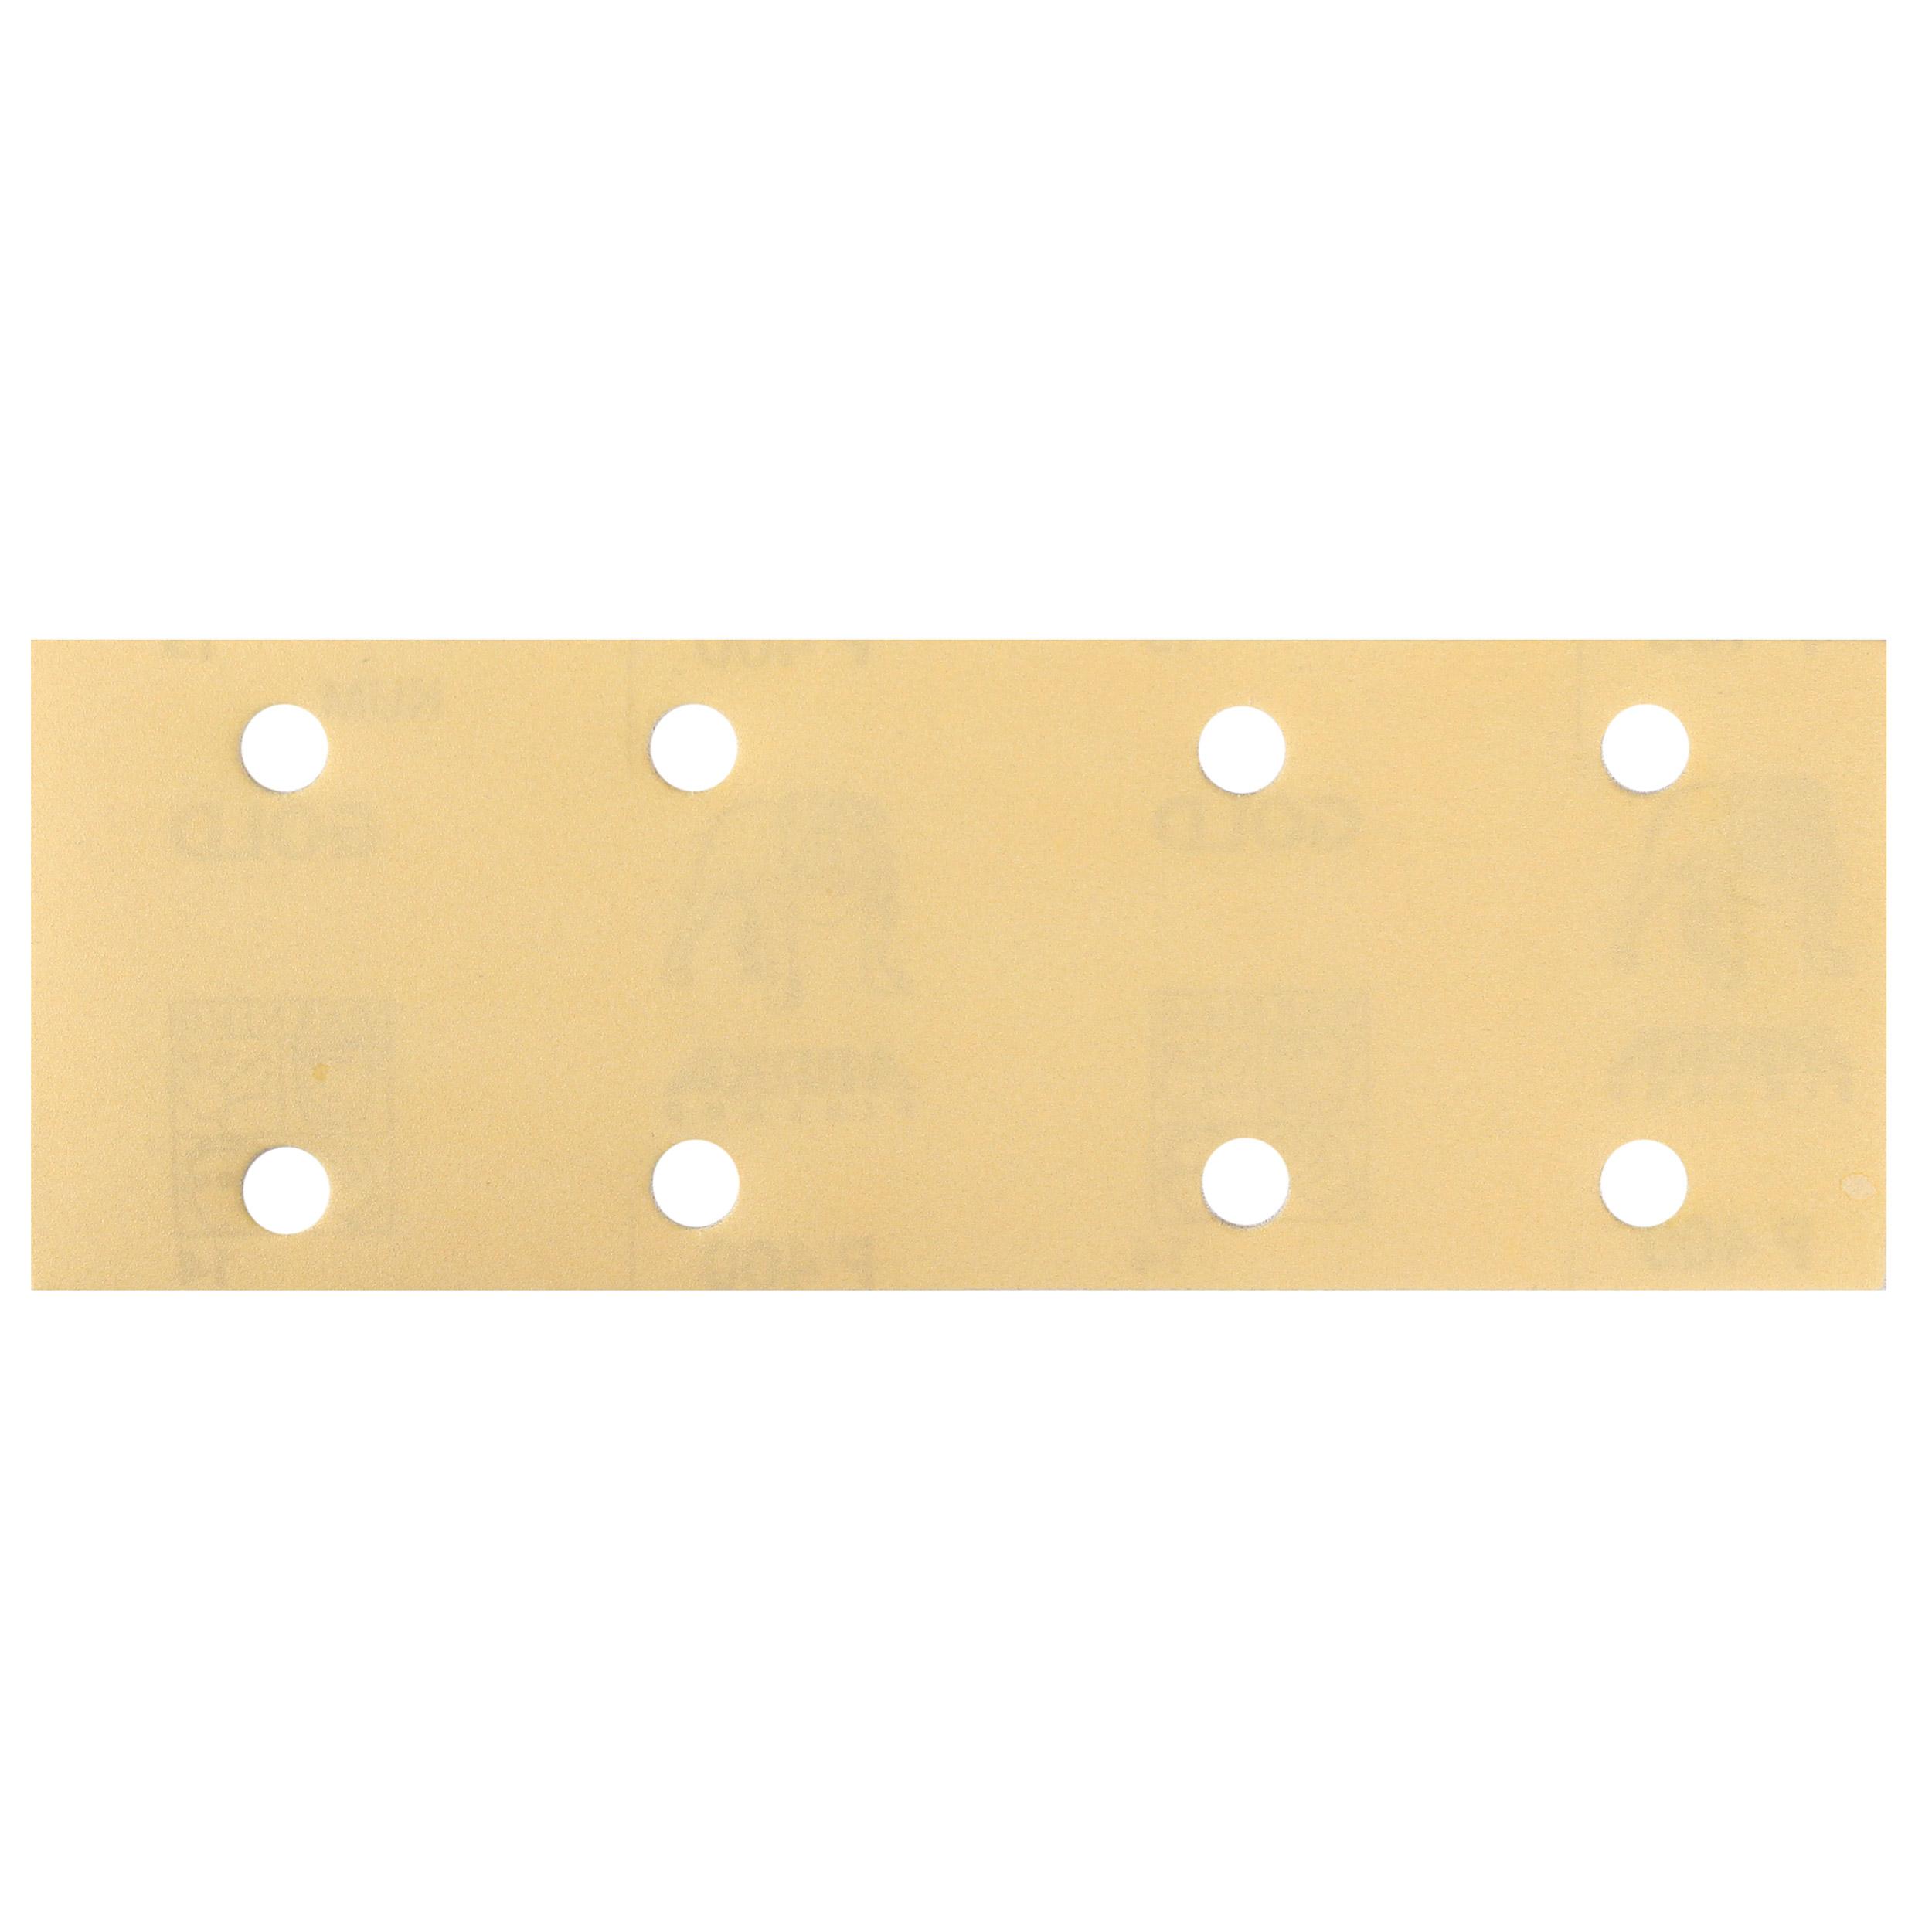 "GOLD 2.75""x8"" Grip Sandpaper, 8H P150, 50 Sheets/Box"